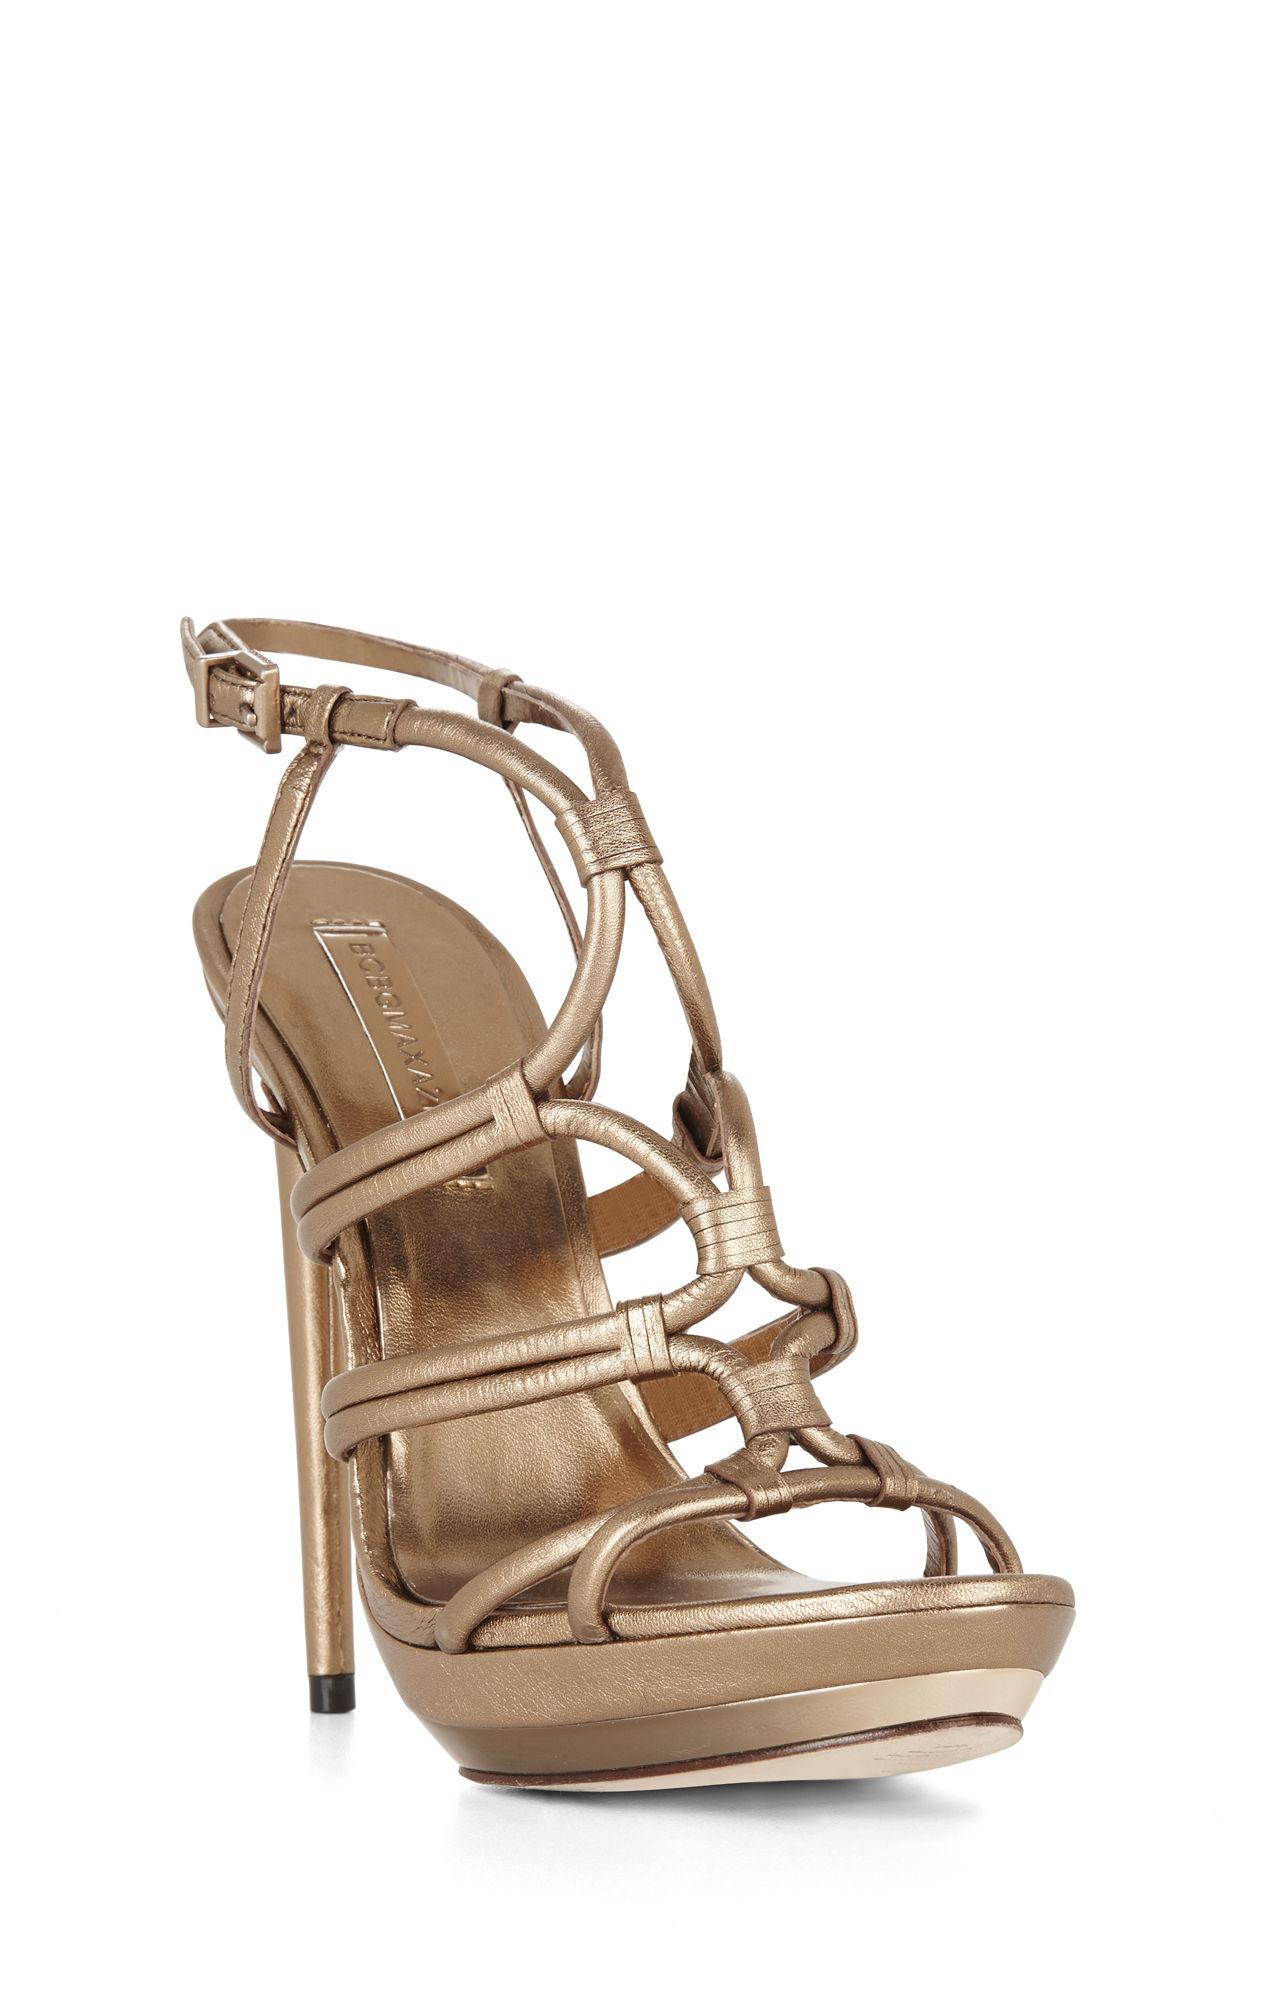 58c88c53019f3c Lyst - BCBGMAXAZRIA Farrow High-heel Strappy Dress Sandal in Brown